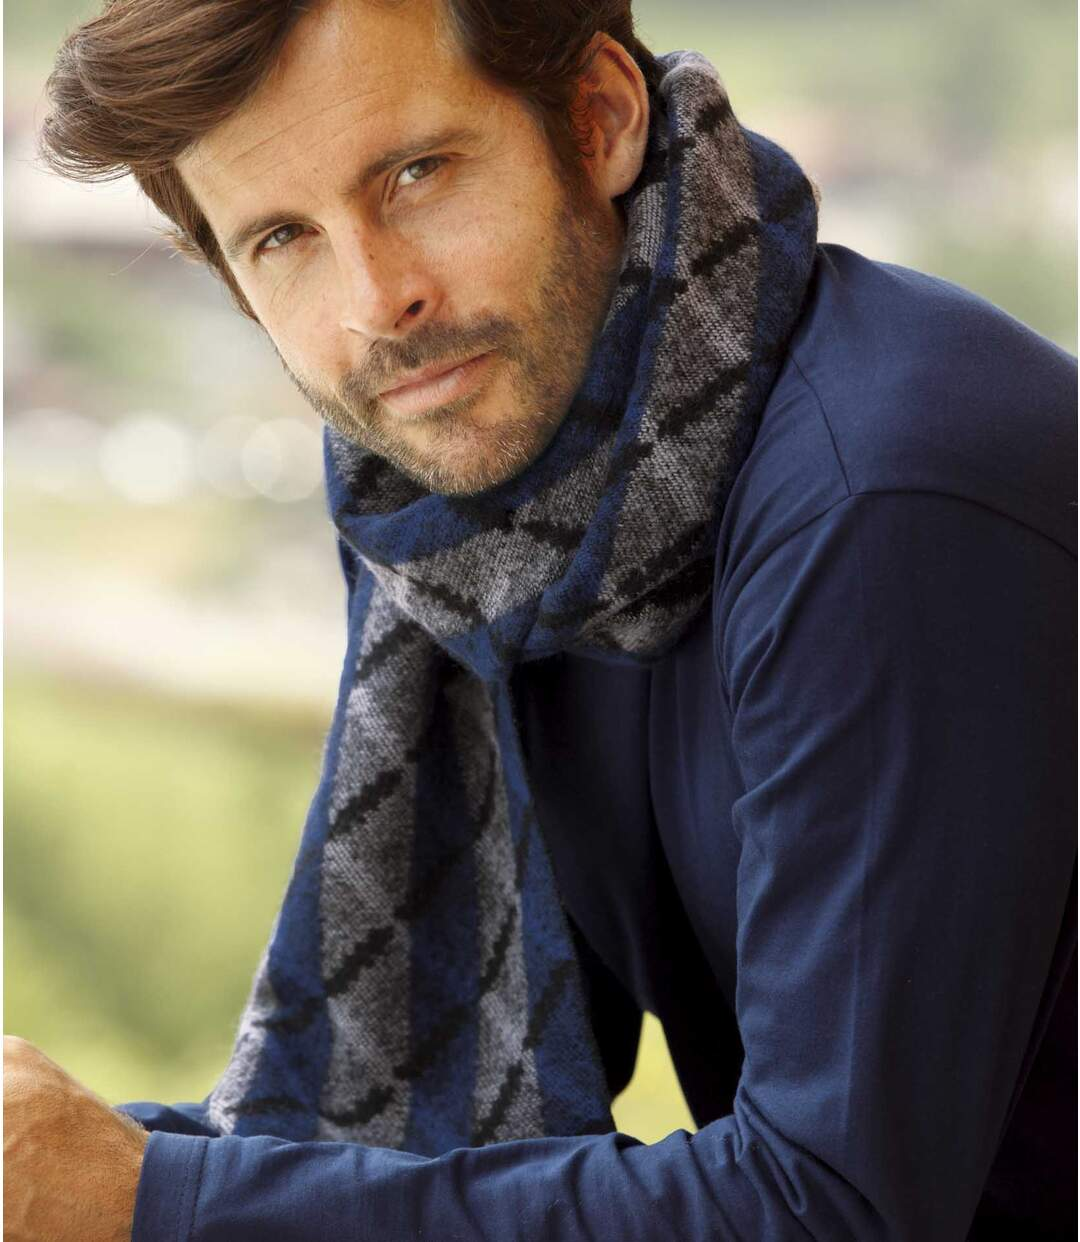 Men's Striped Knit Scarf - Blue Grey Black